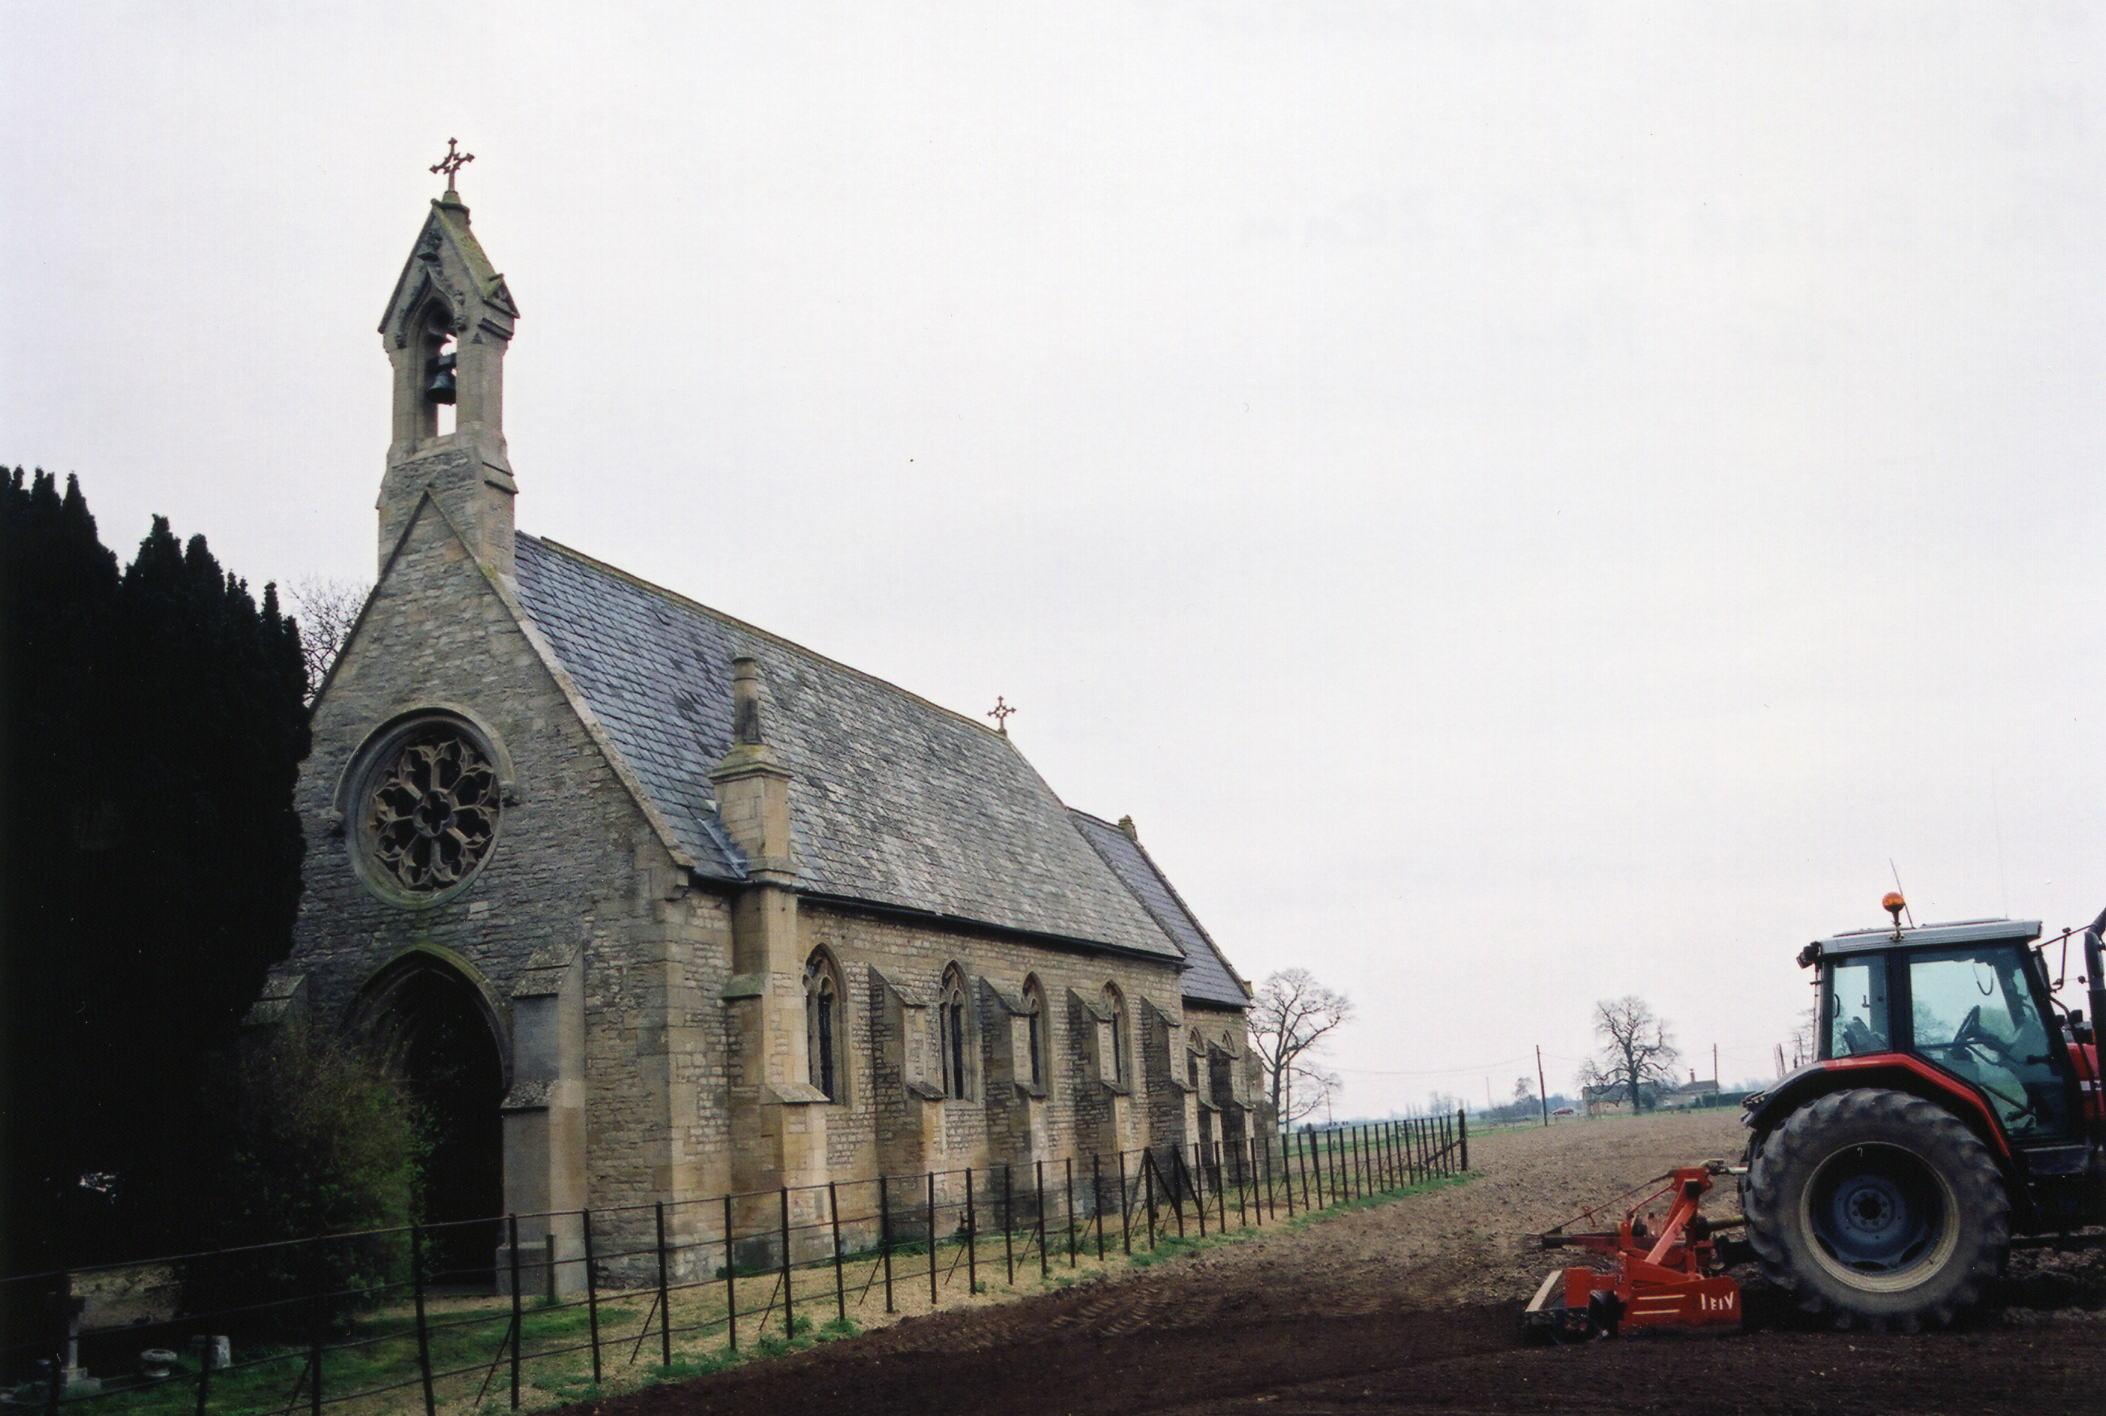 Brothertoft St. Gilbert parish church